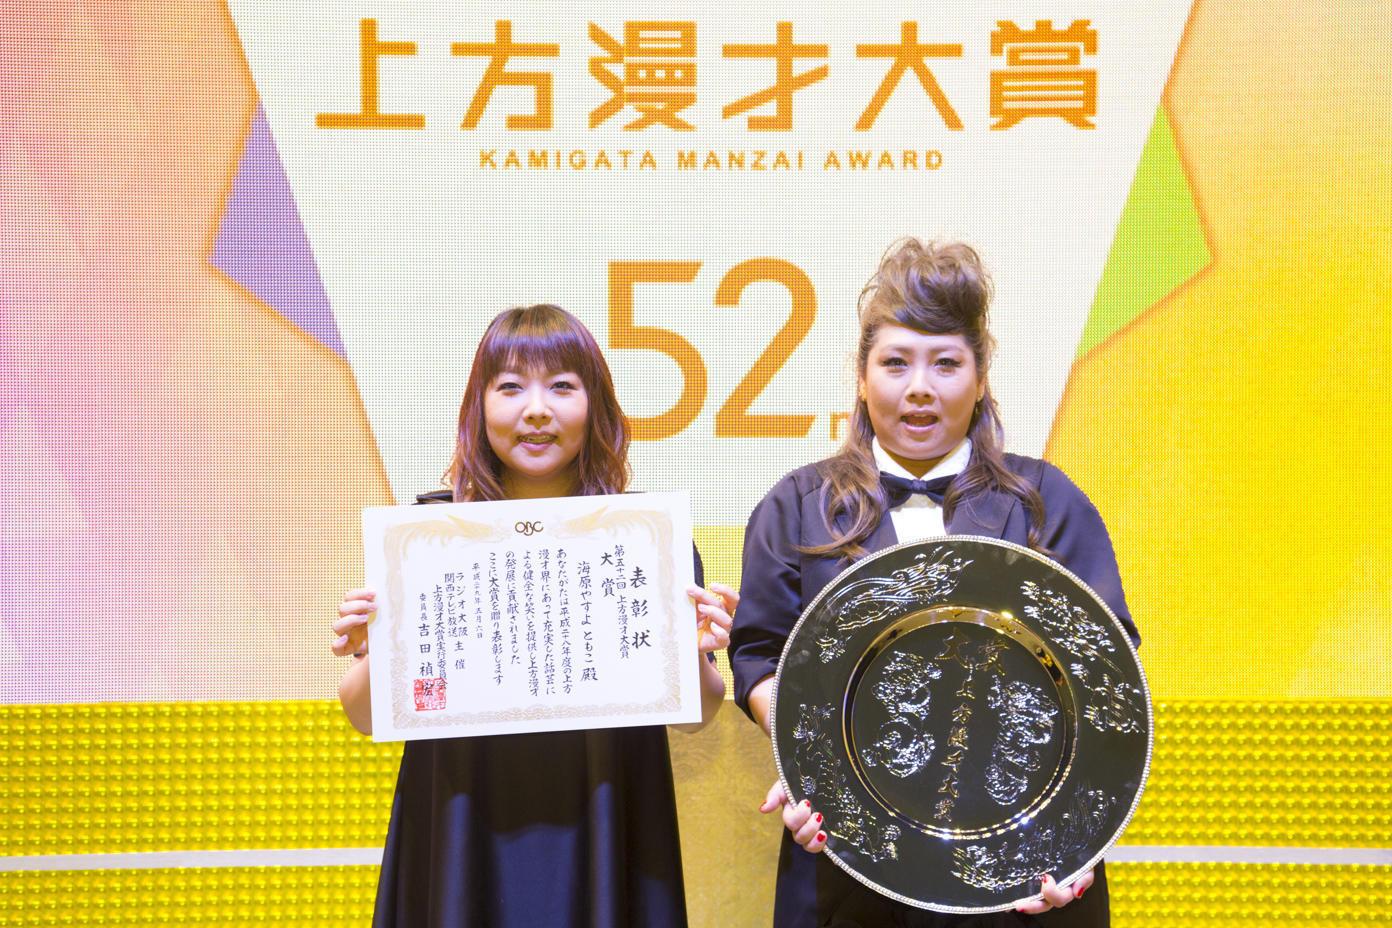 http://news.yoshimoto.co.jp/20170507224009-b53971675a8e3fb68b35e5dbc11b1741ab029a84.jpg